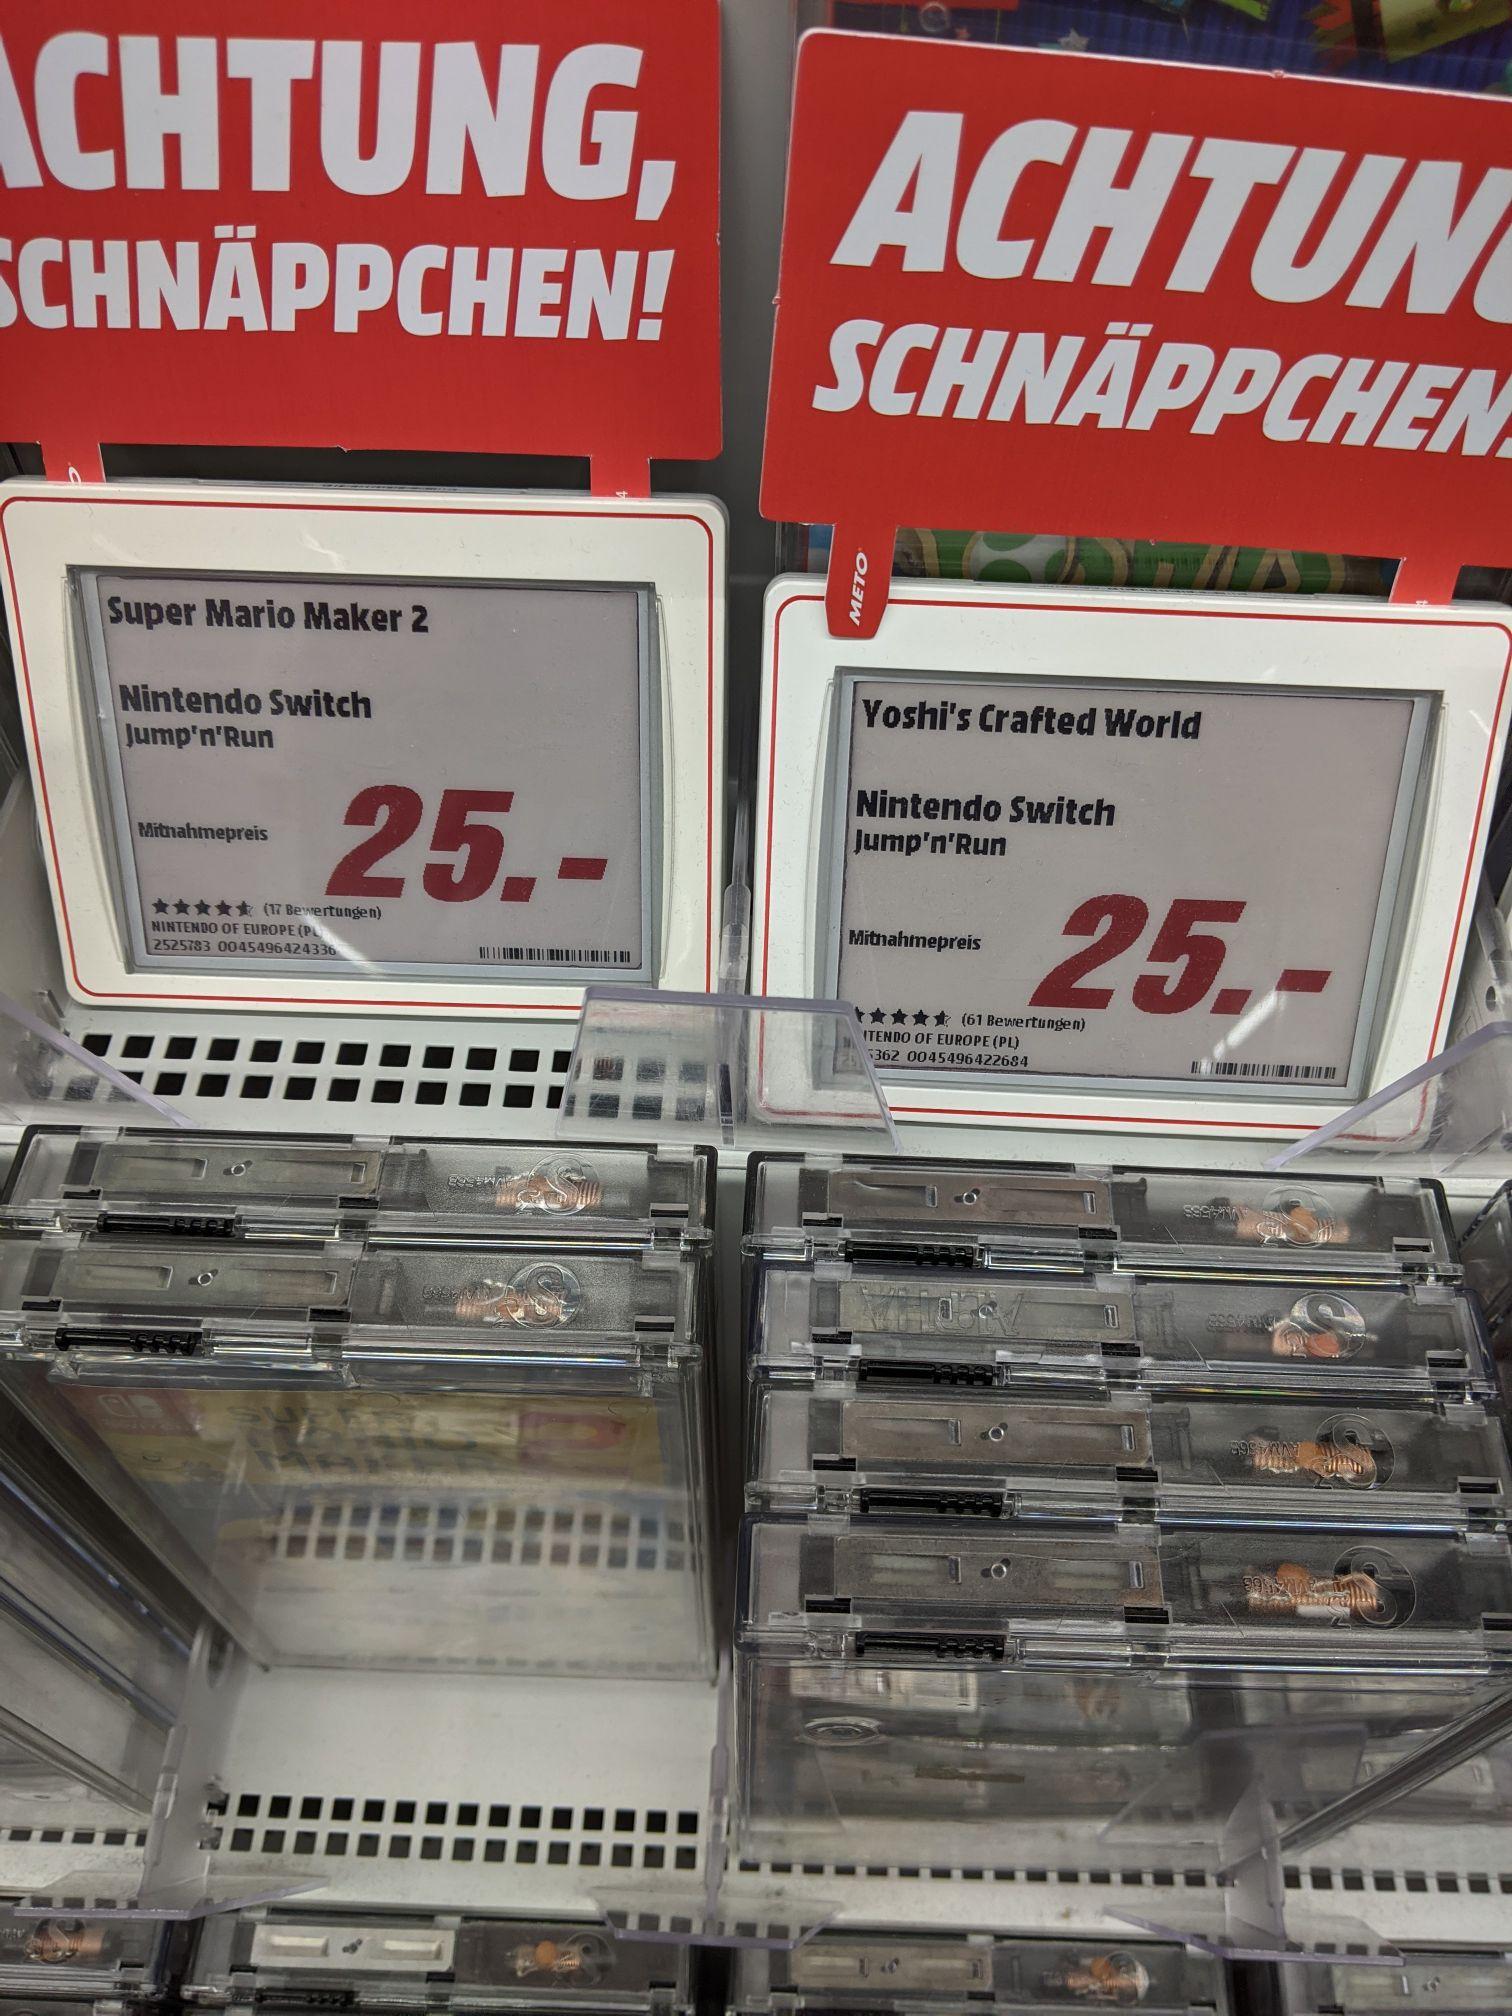 Mediamarkt Alexanderplatz: Mario Maker 2, Yoshi's Crafted World 25€ u.a.